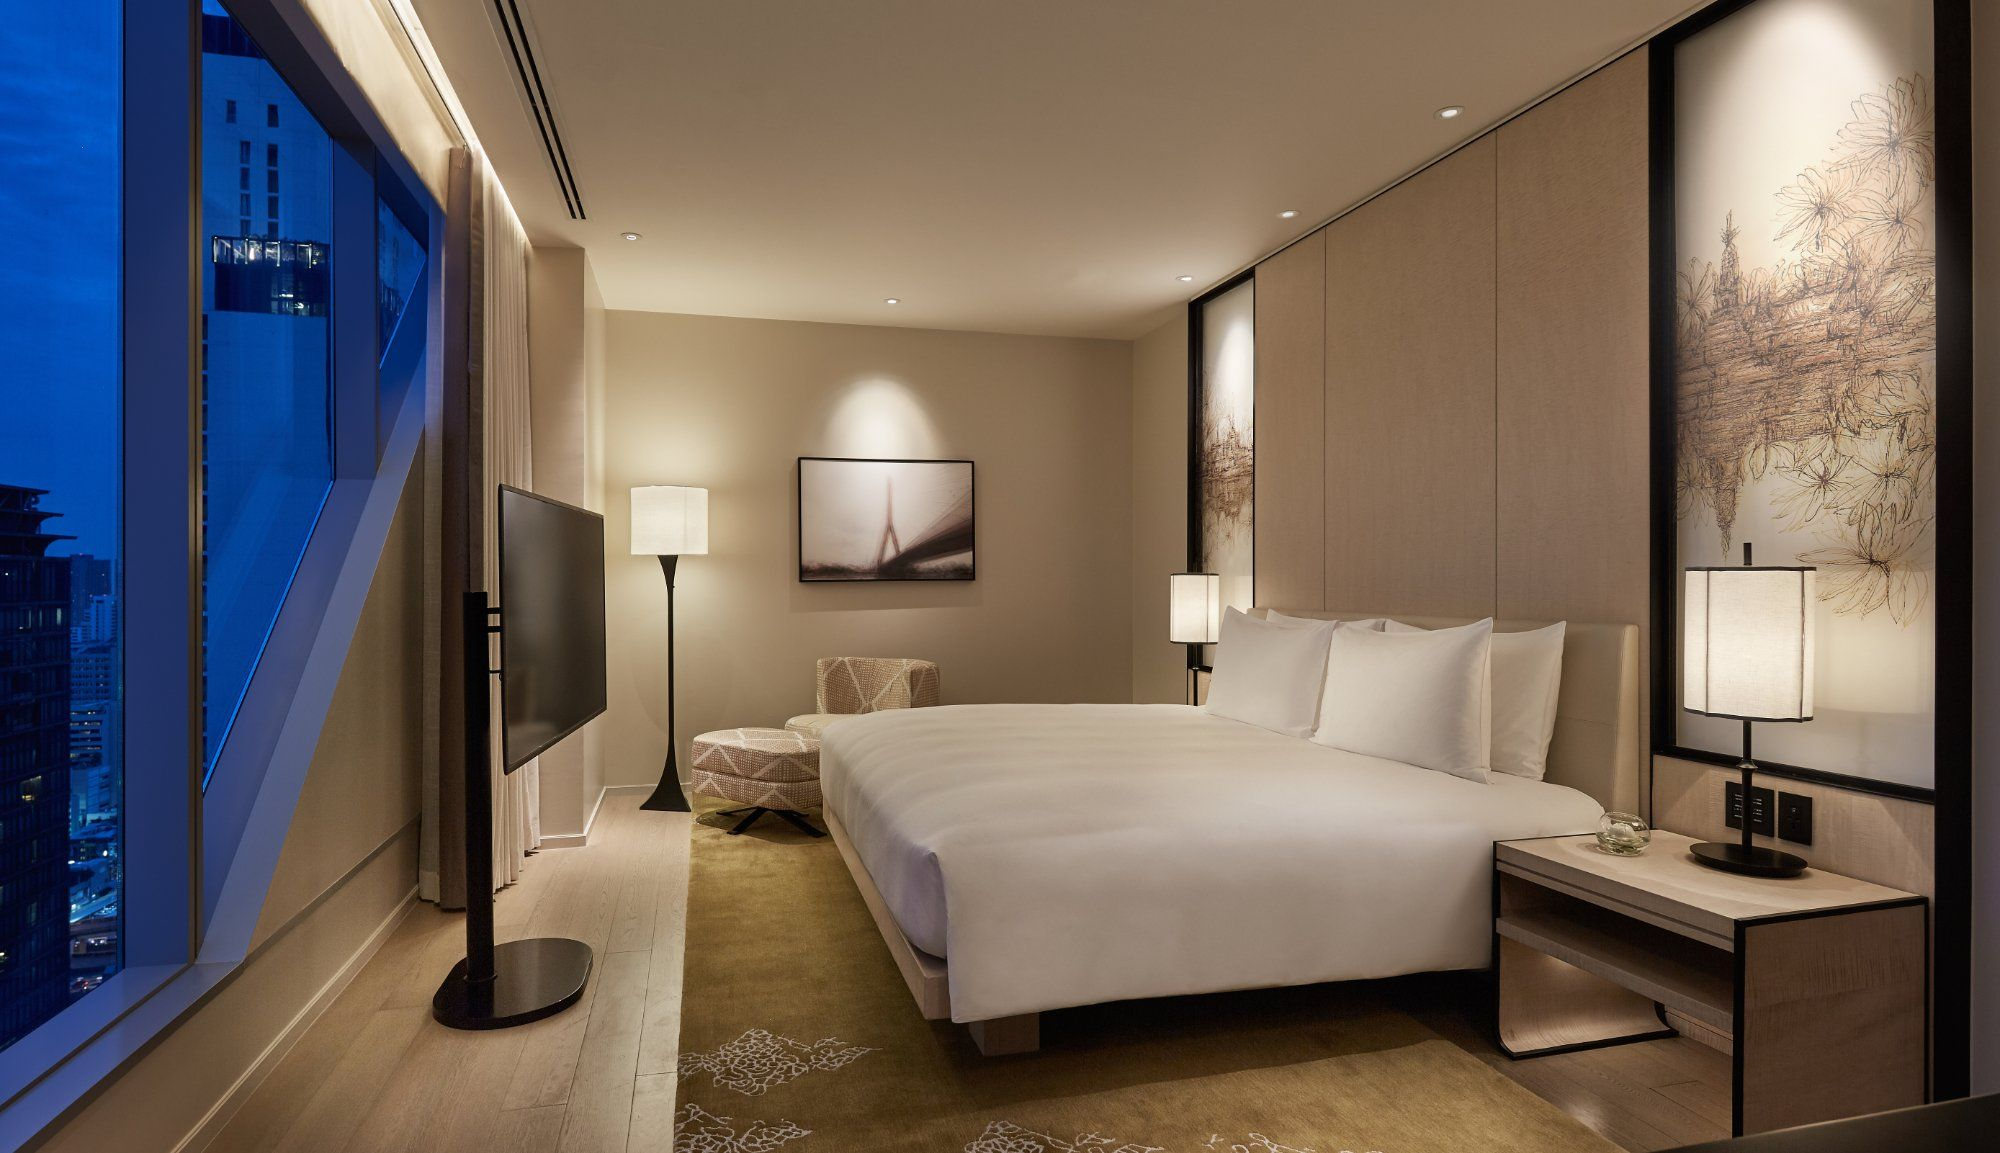 Park Hyatt Bangkok: UPDATED 2018 Hotel Reviews, Price